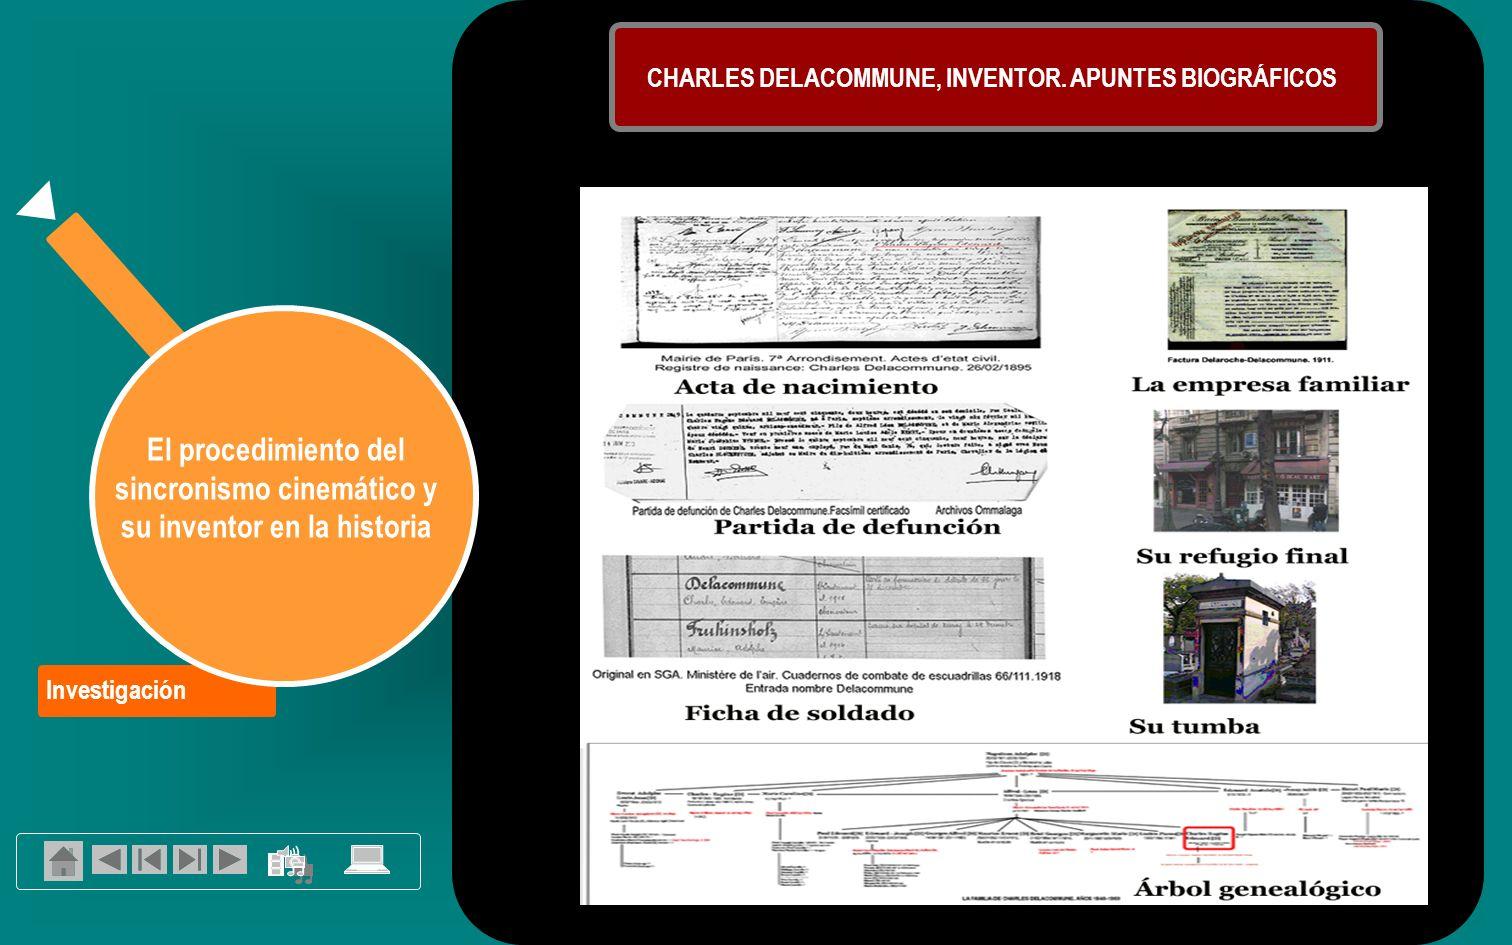 CHARLES DELACOMMUNE, INVENTOR. APUNTES BIOGRÁFICOS